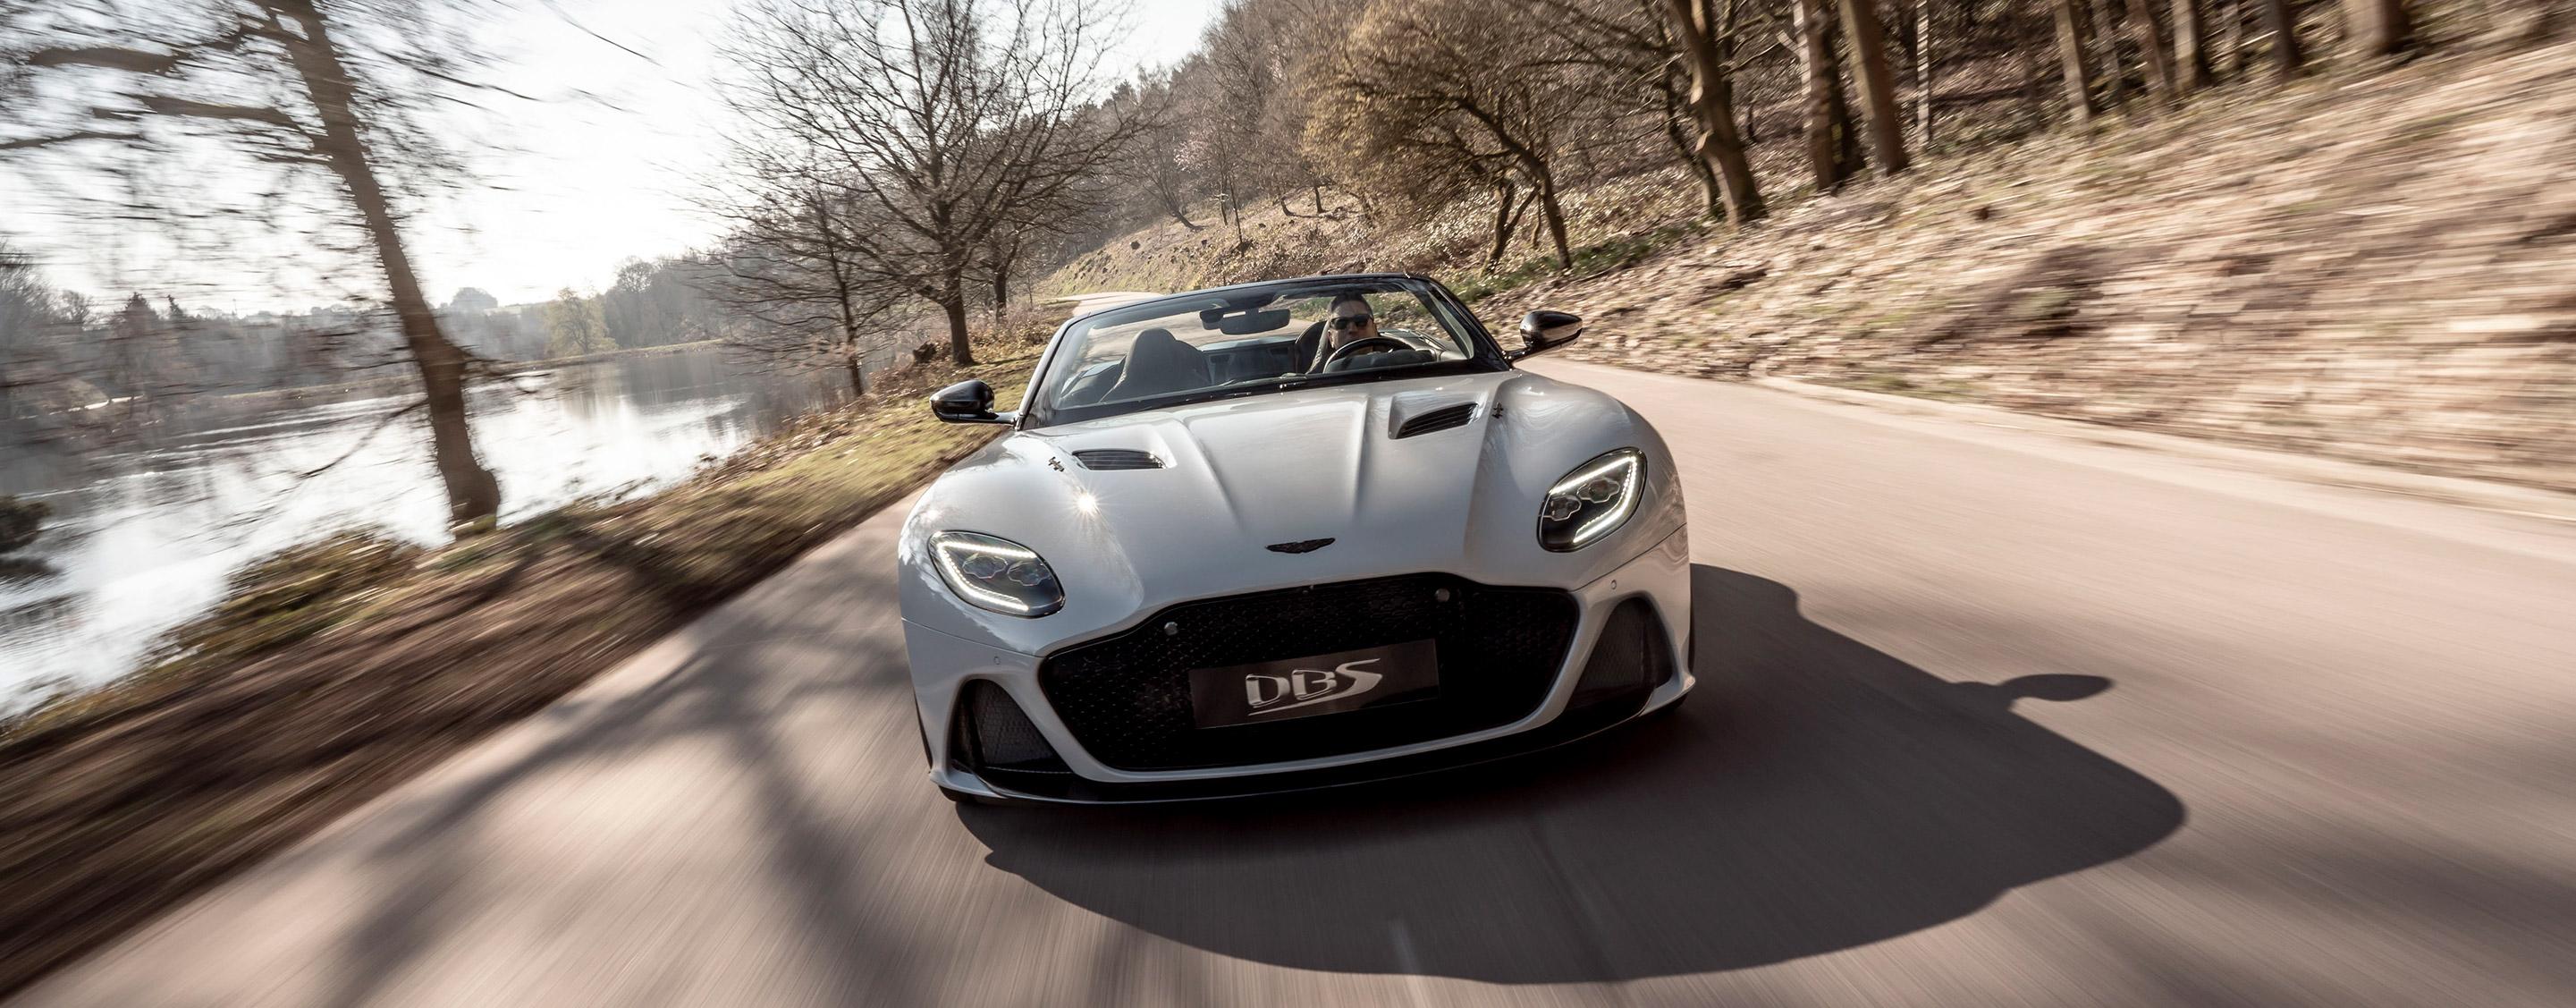 TrackWorthy - Aston Martin DBS Superleggera Volante (3)